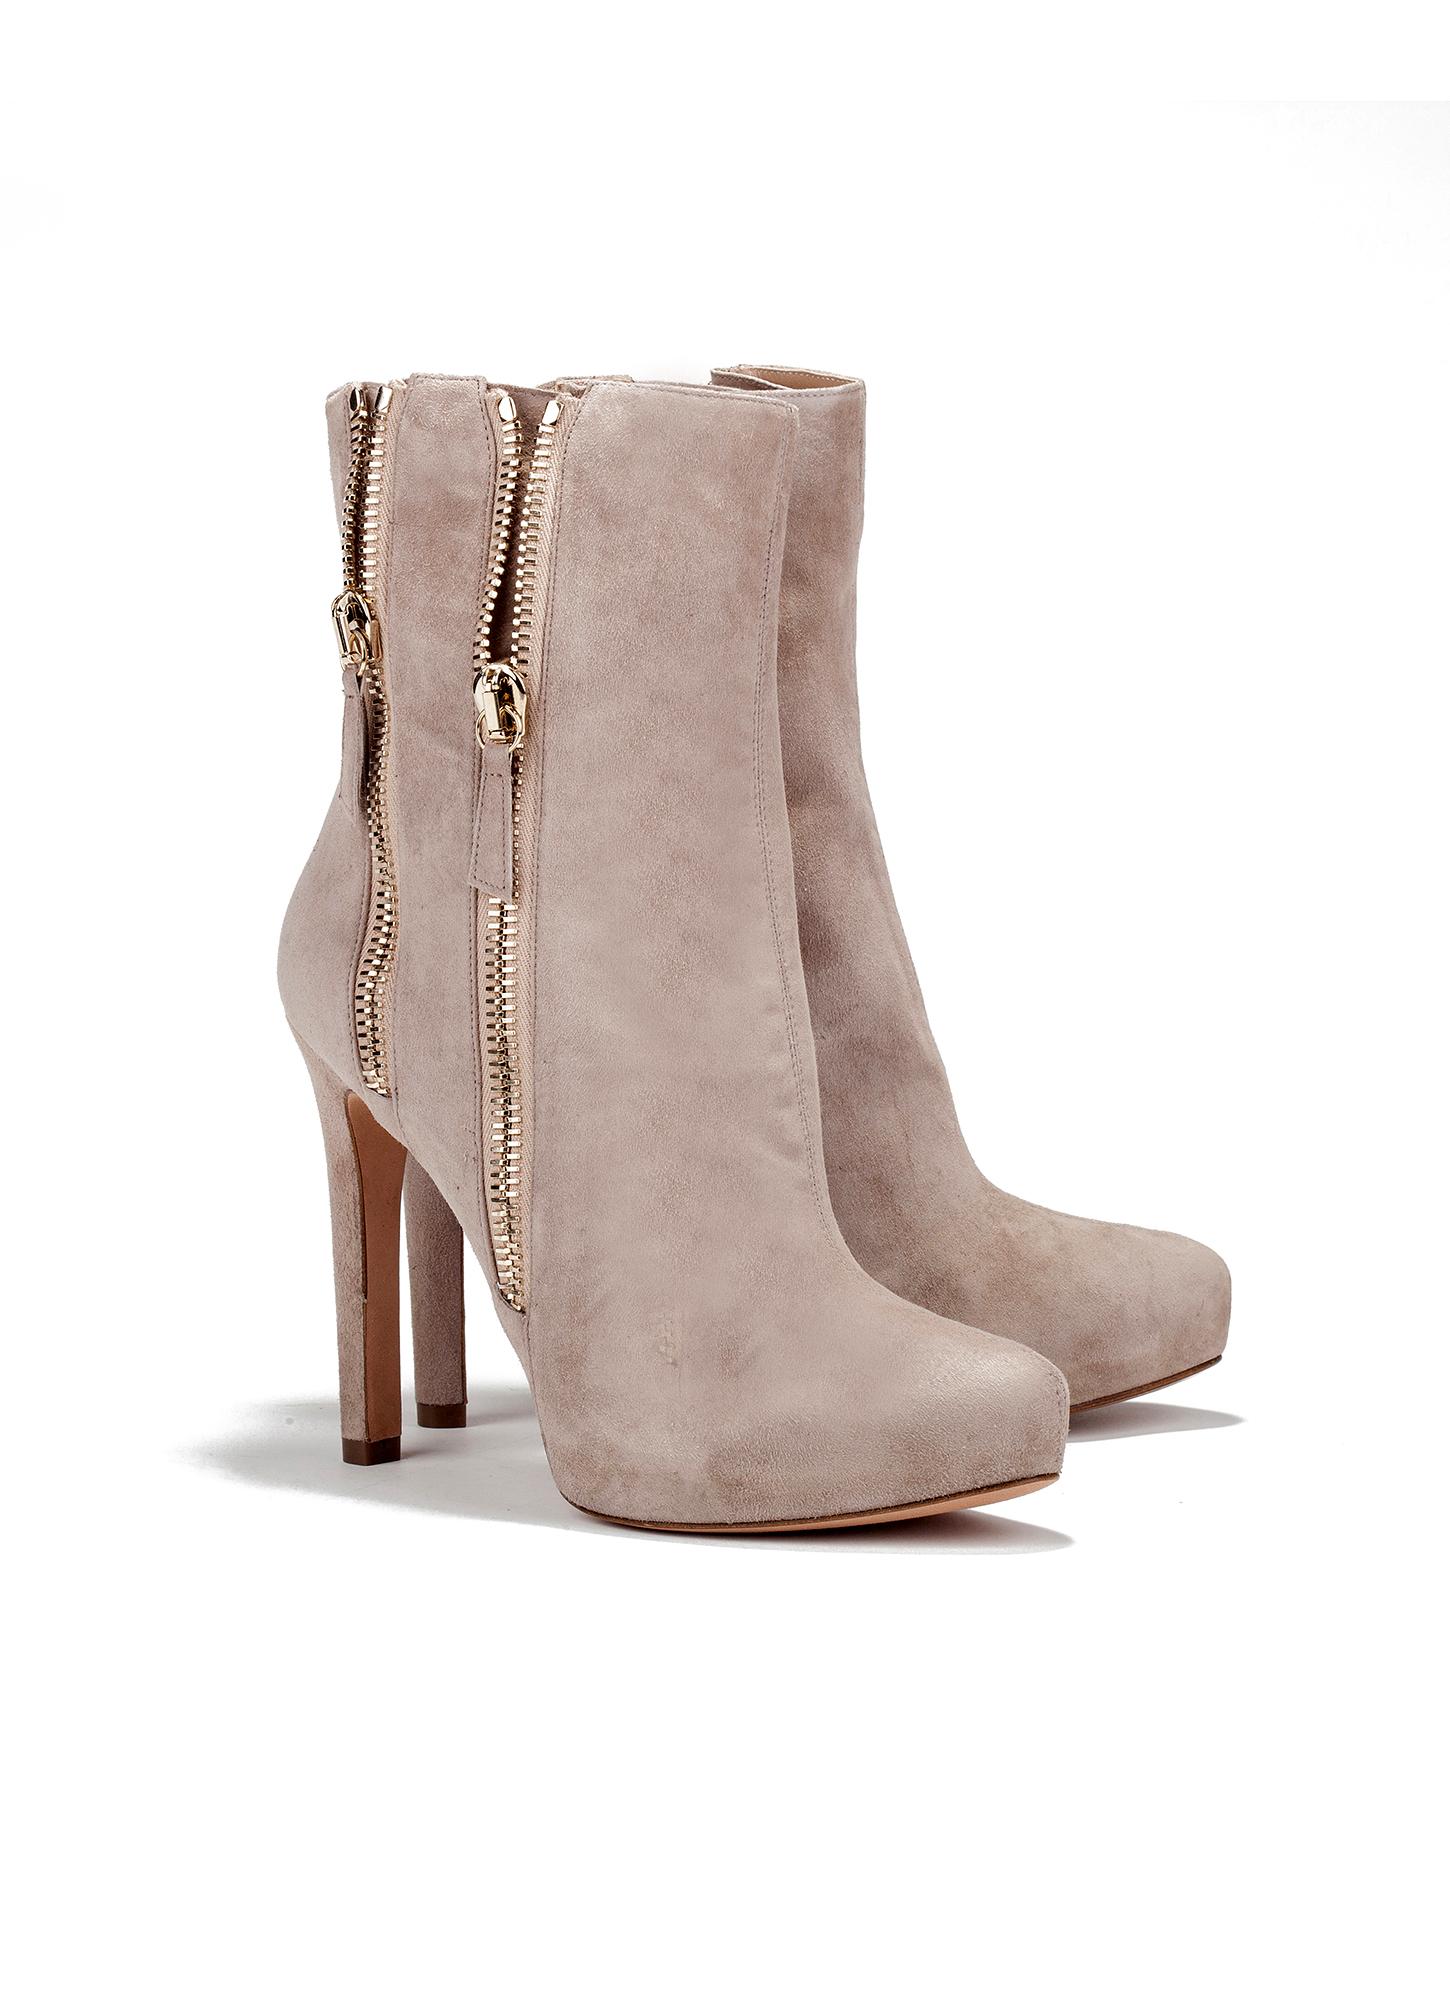 Pura LopezHigh heels - kaky DDcQNyUJa